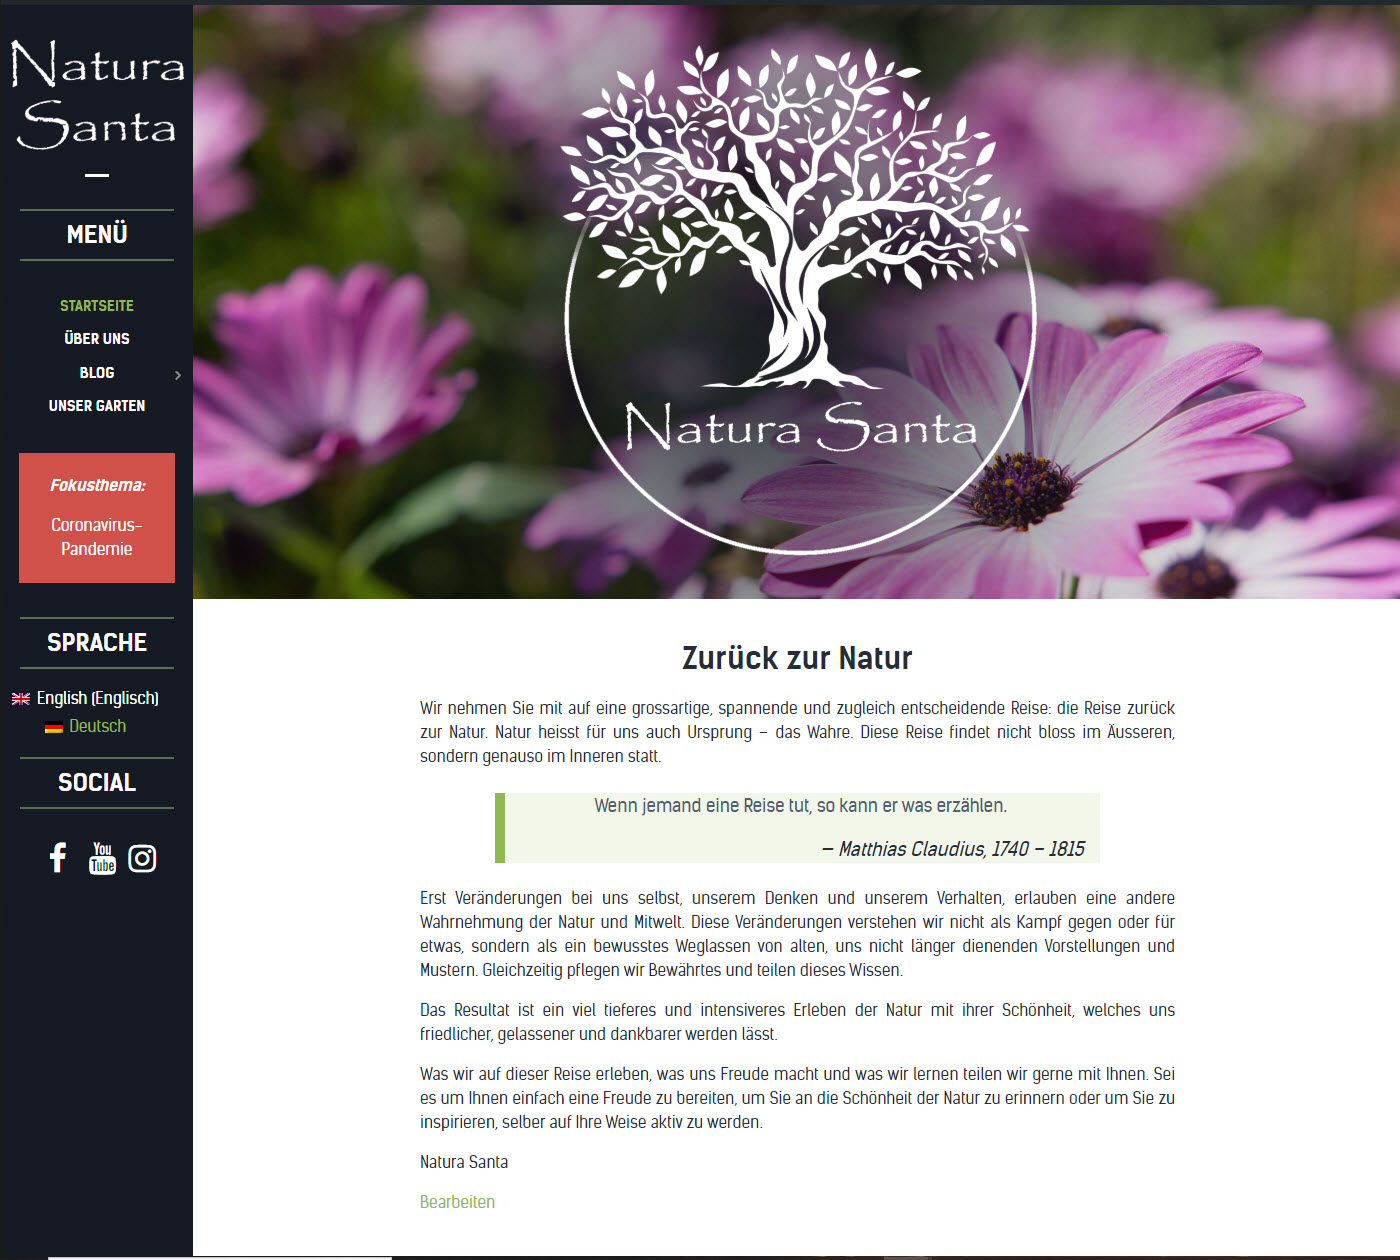 Natura Santa - Zurück zur Natur